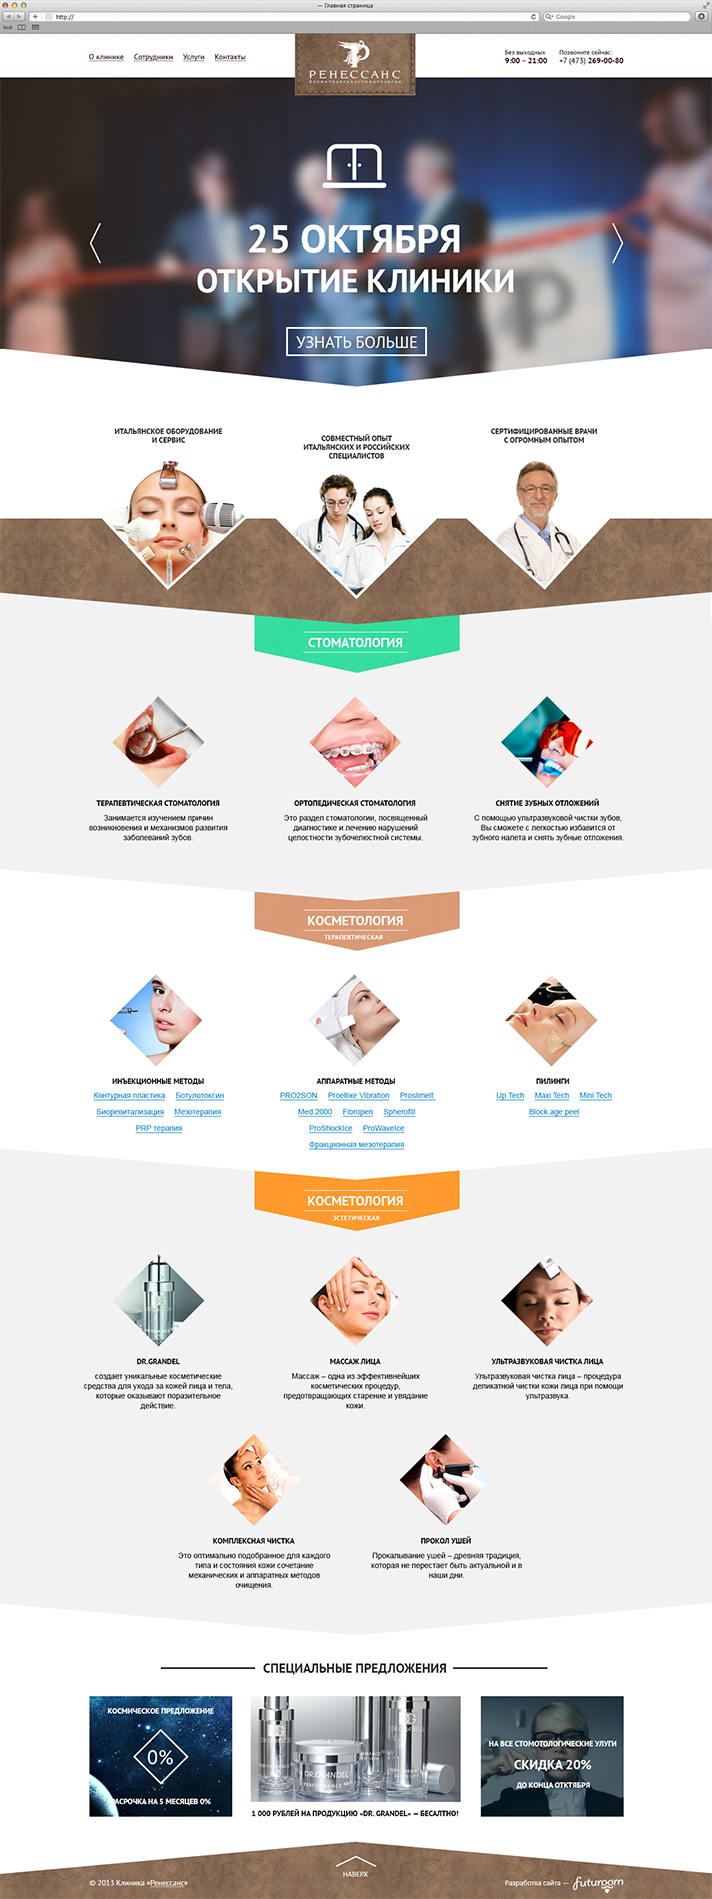 Клиника косметологии и стоматологии